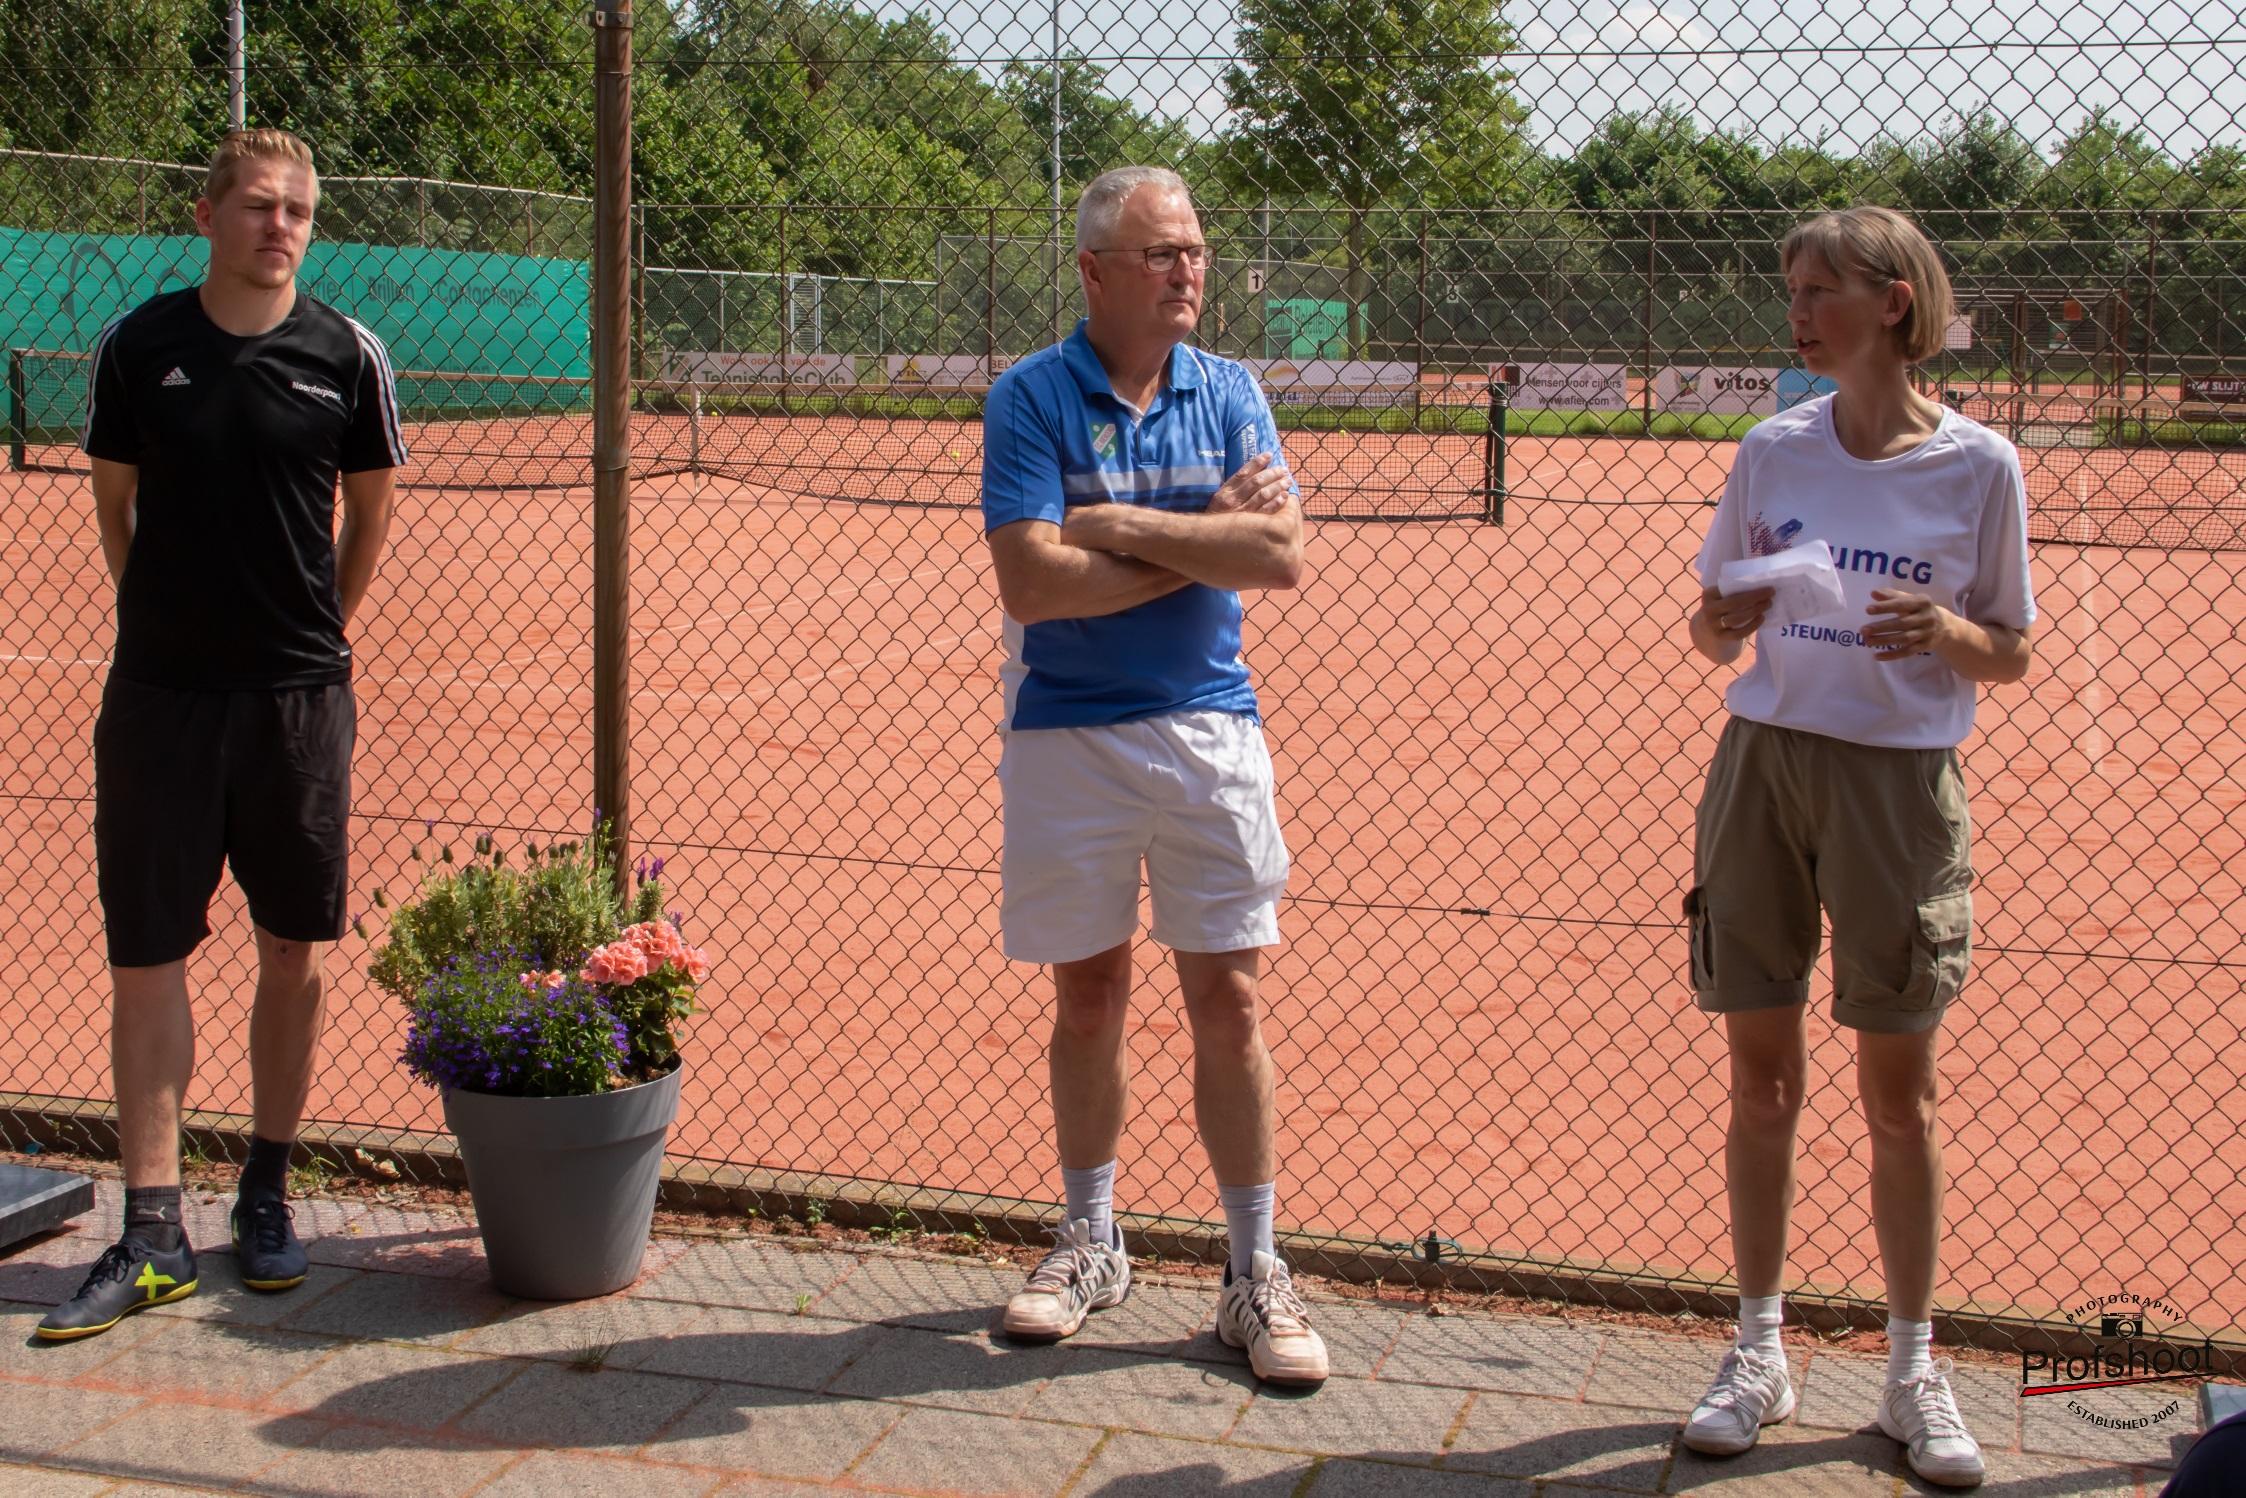 20190623_tennis_toernooi_tc_nienoord_umcg_0010_2.jpg